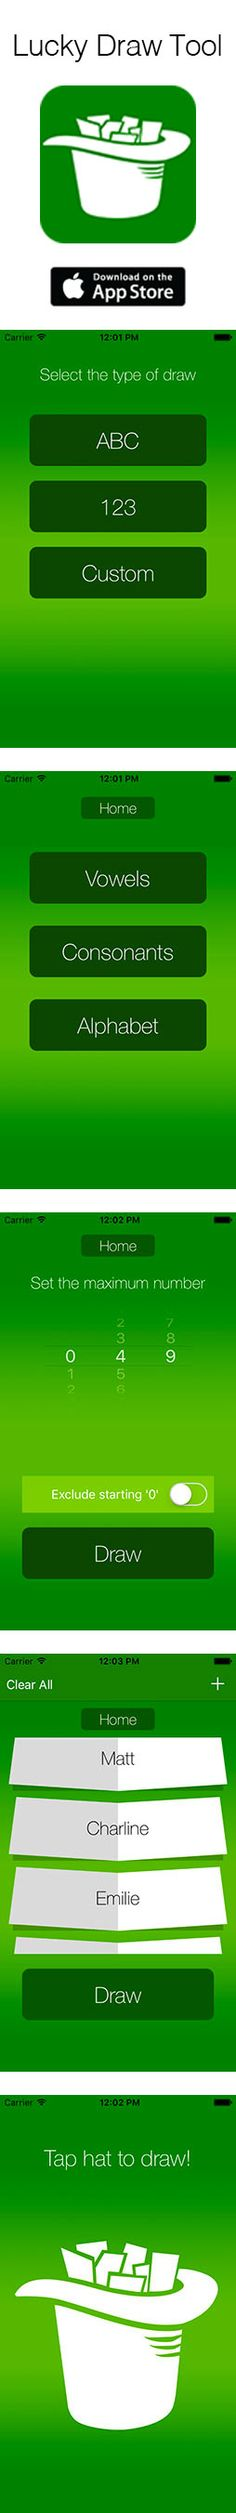 FREE app for iOS9 https://itunes.apple.com/en/app/lucky-draw-tool-draw-numbers/id1063332030?l=en&mt=8